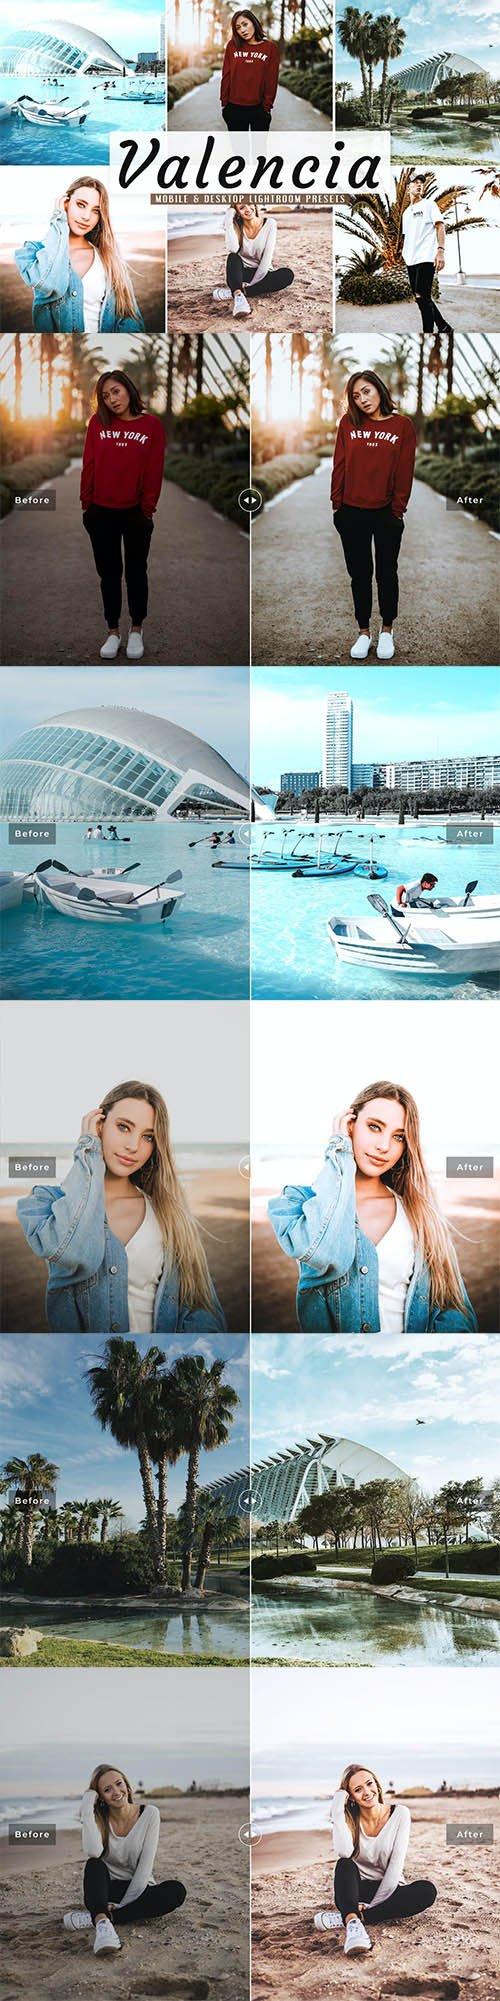 Valencia Mobile & Desktop Lightroom Presets